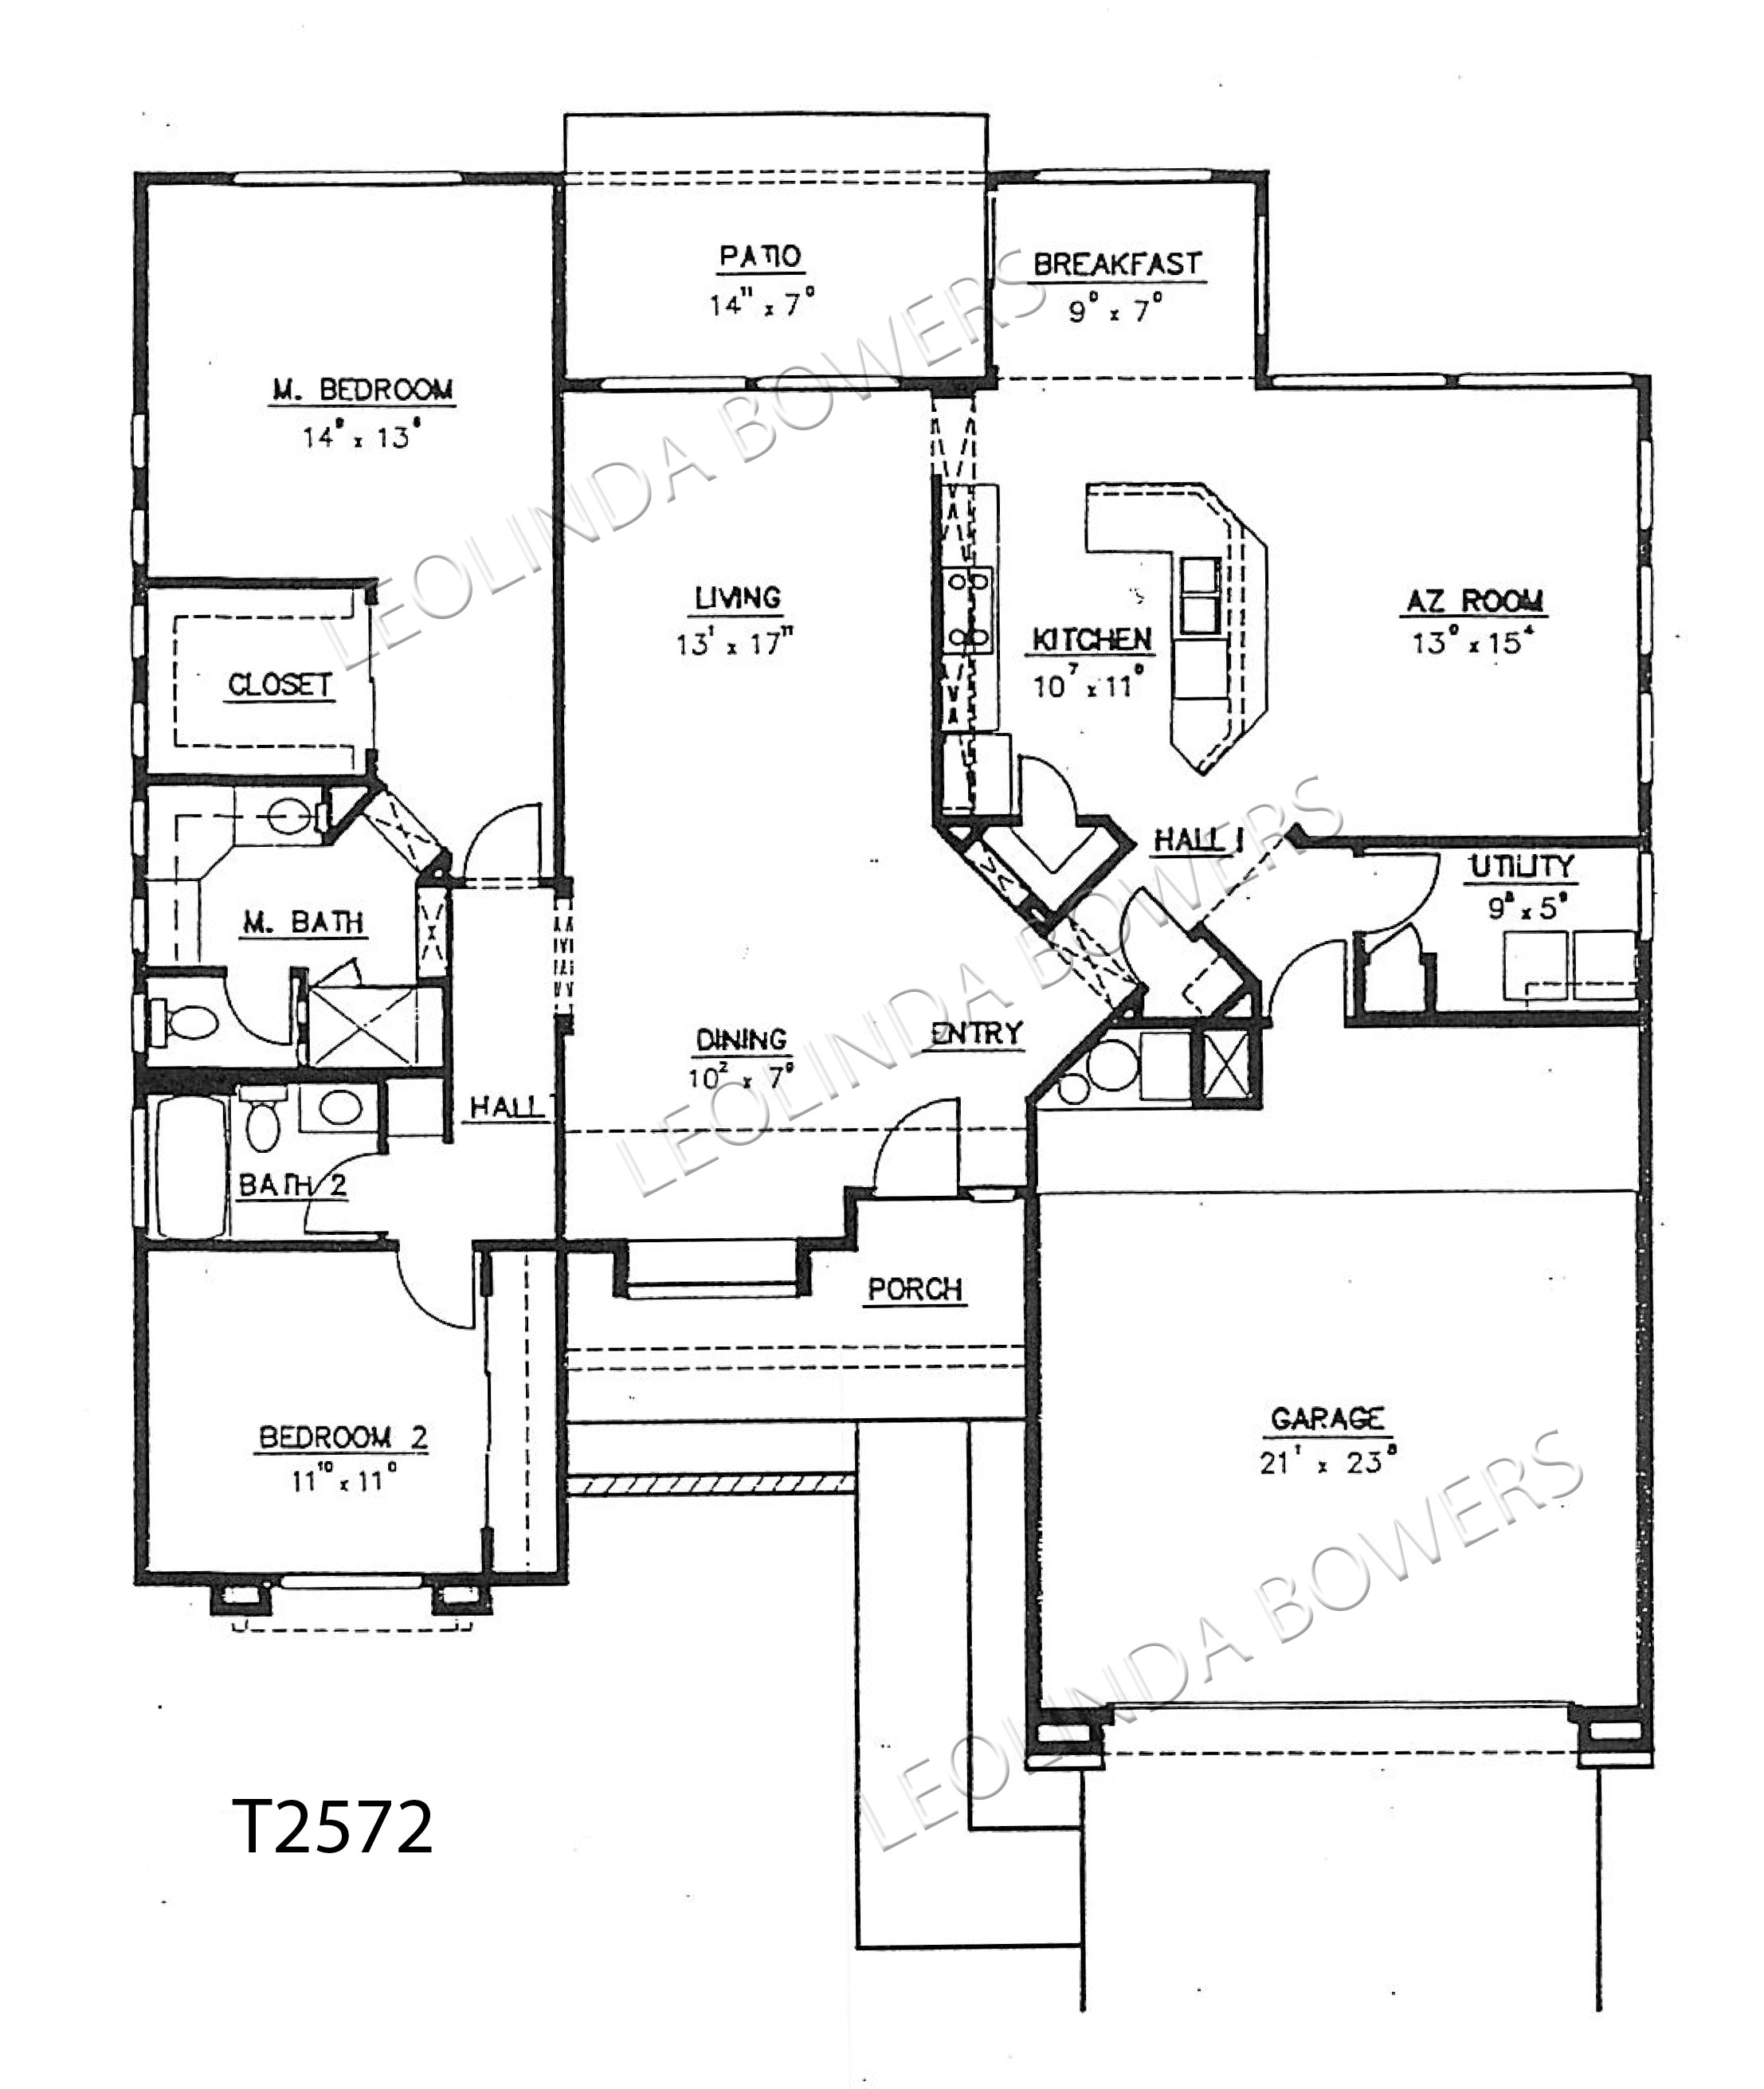 sun city west royale floor plan